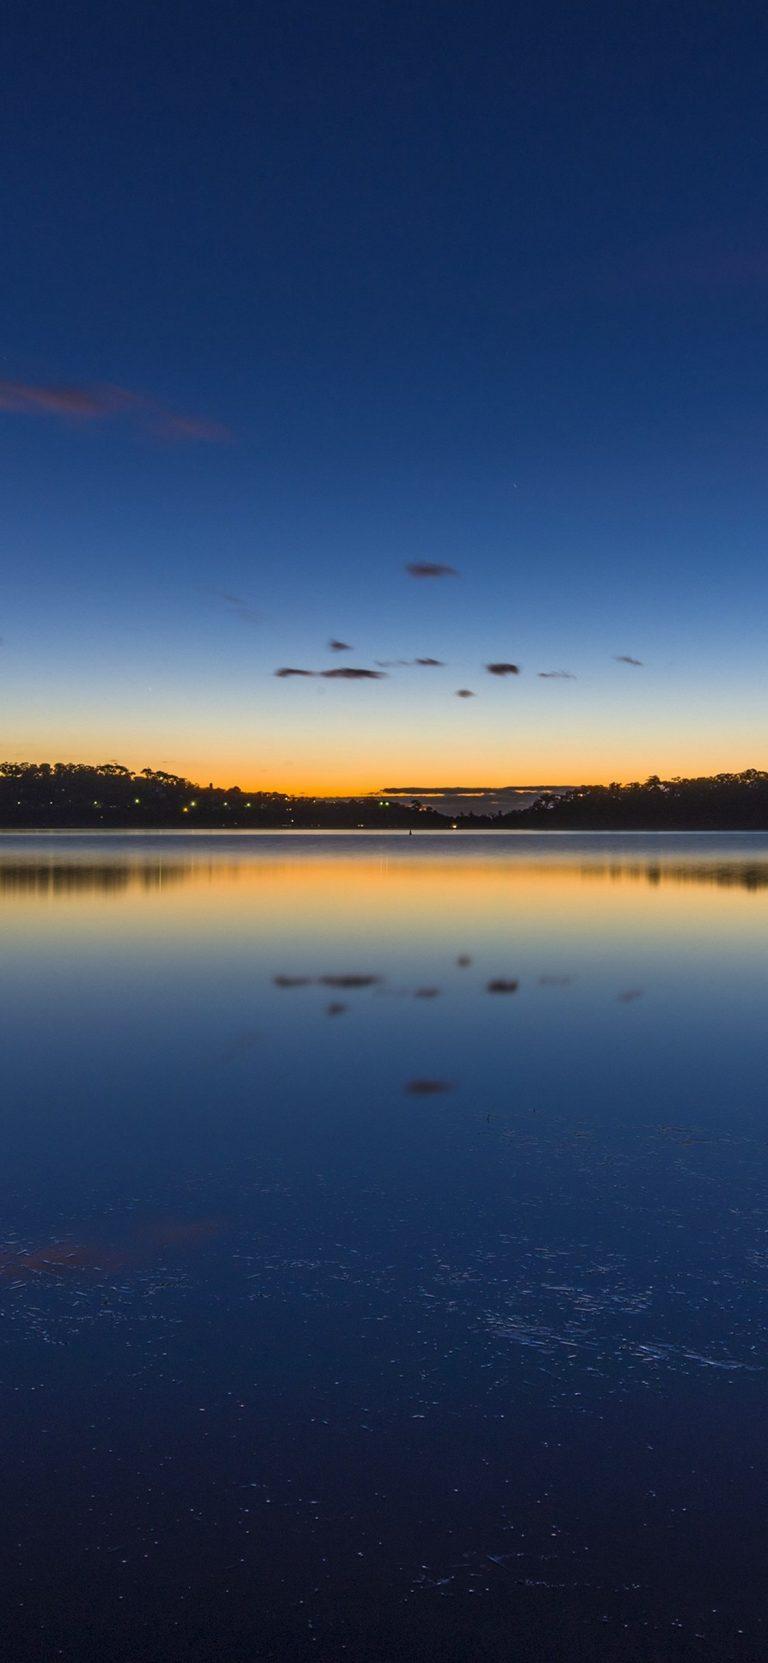 Nature Lake Sunset Landscapehd HD Wallpaper 1125x2436 768x1663